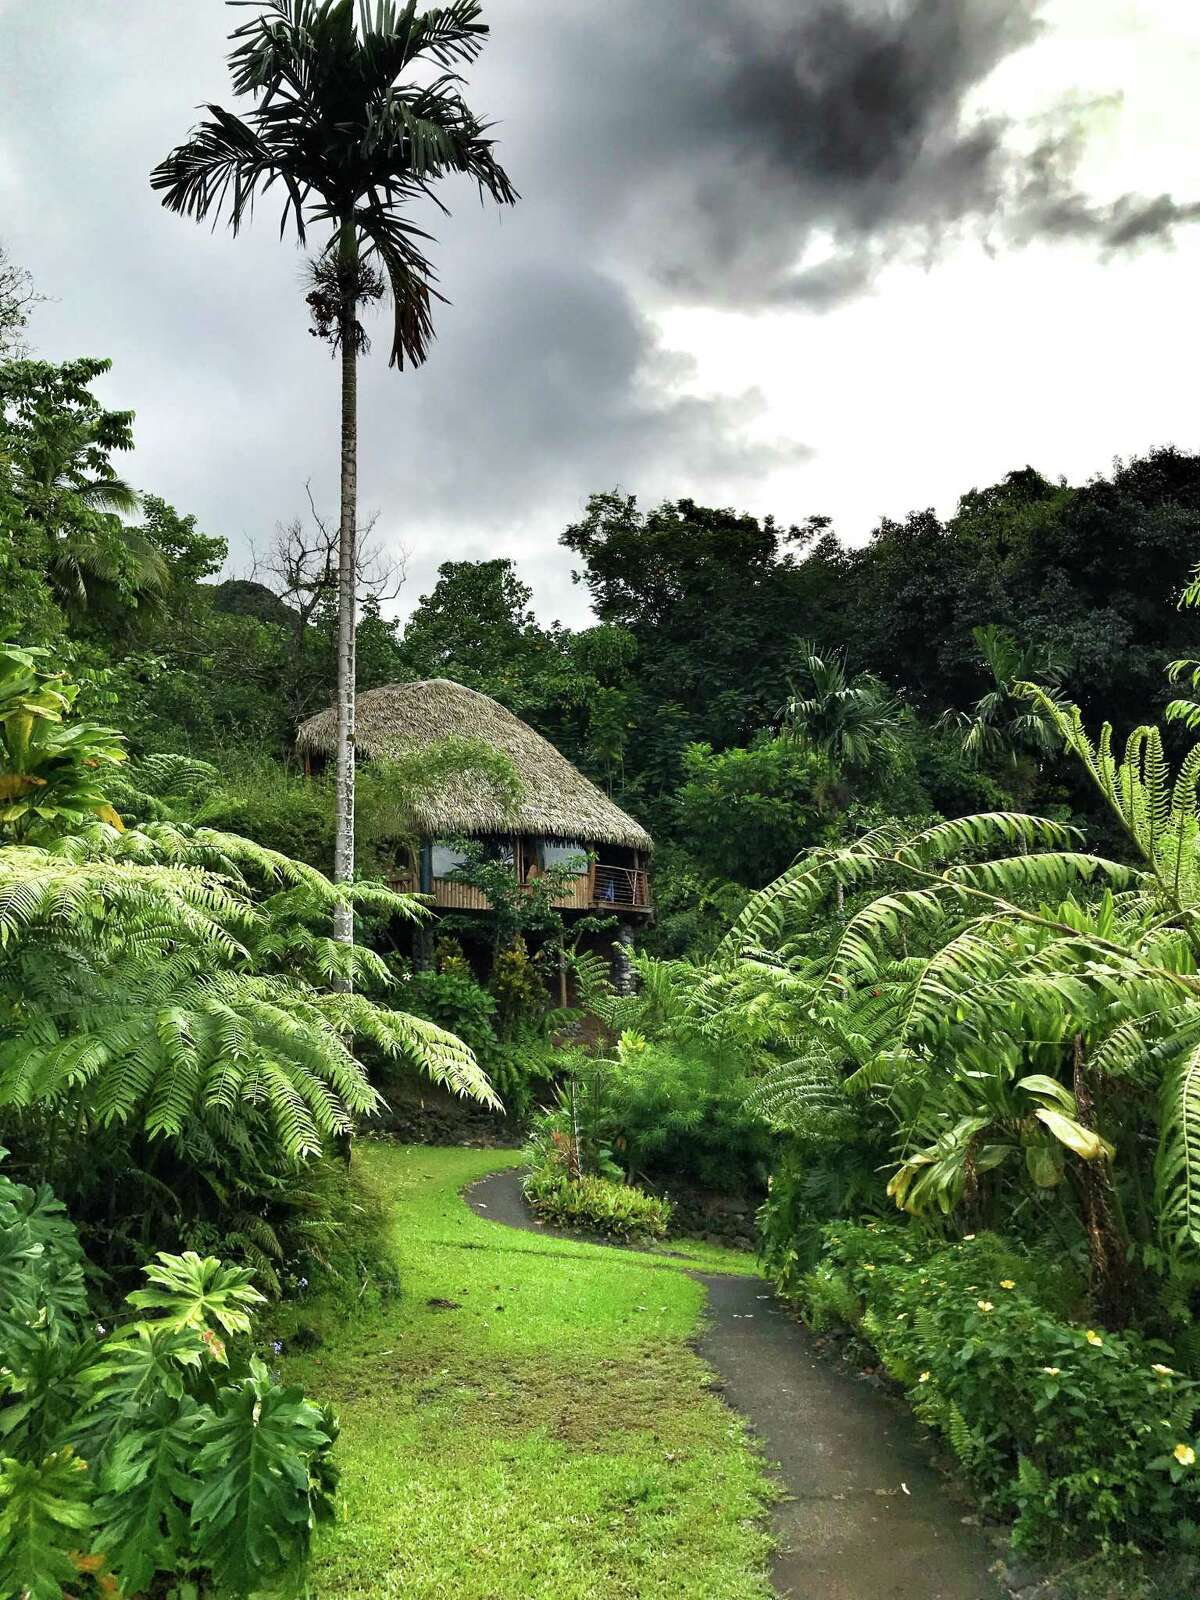 Guests stay in thatched roof huts at Vanira Lodge, Tahiti Iti.